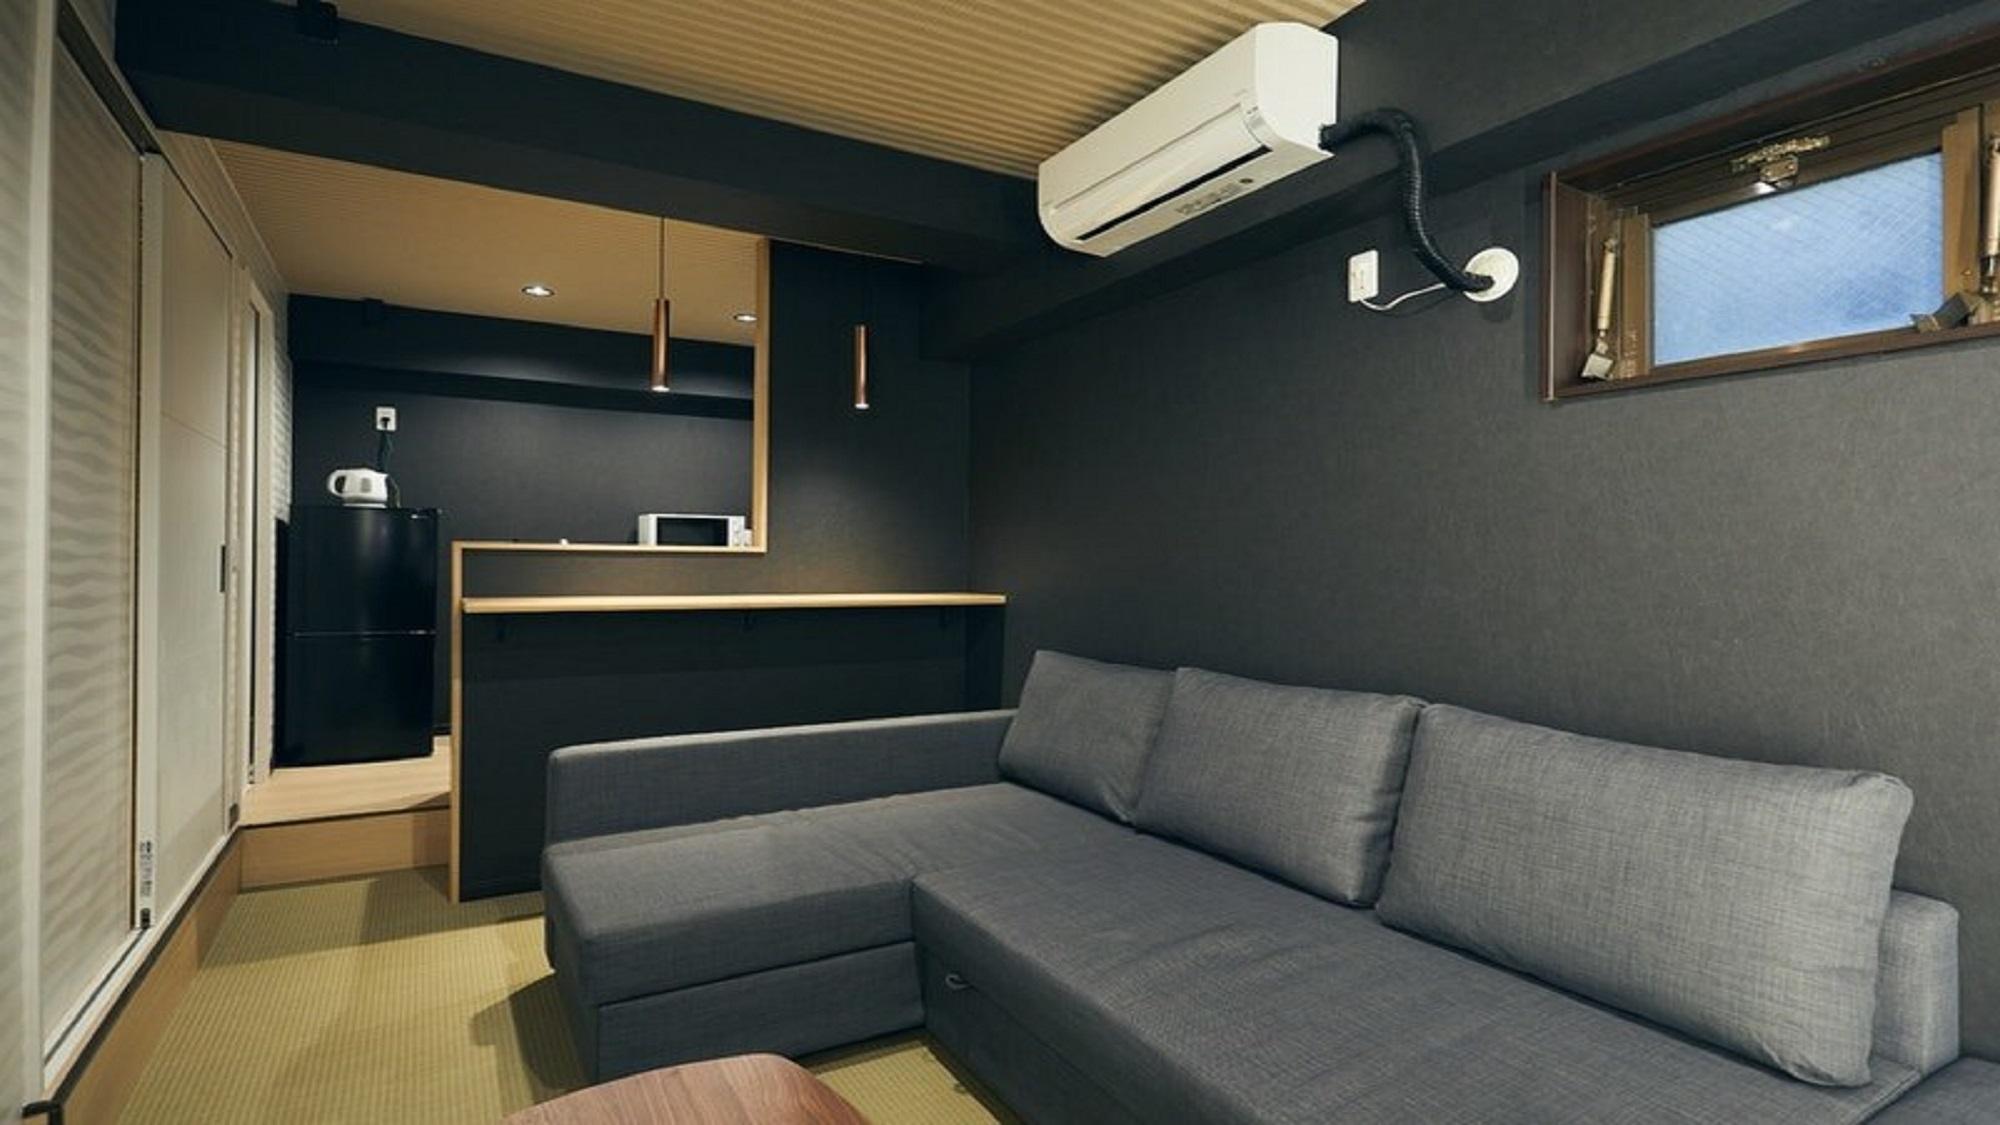 The Gratias Hotel浅草スマイル【Vacation STAY提供】